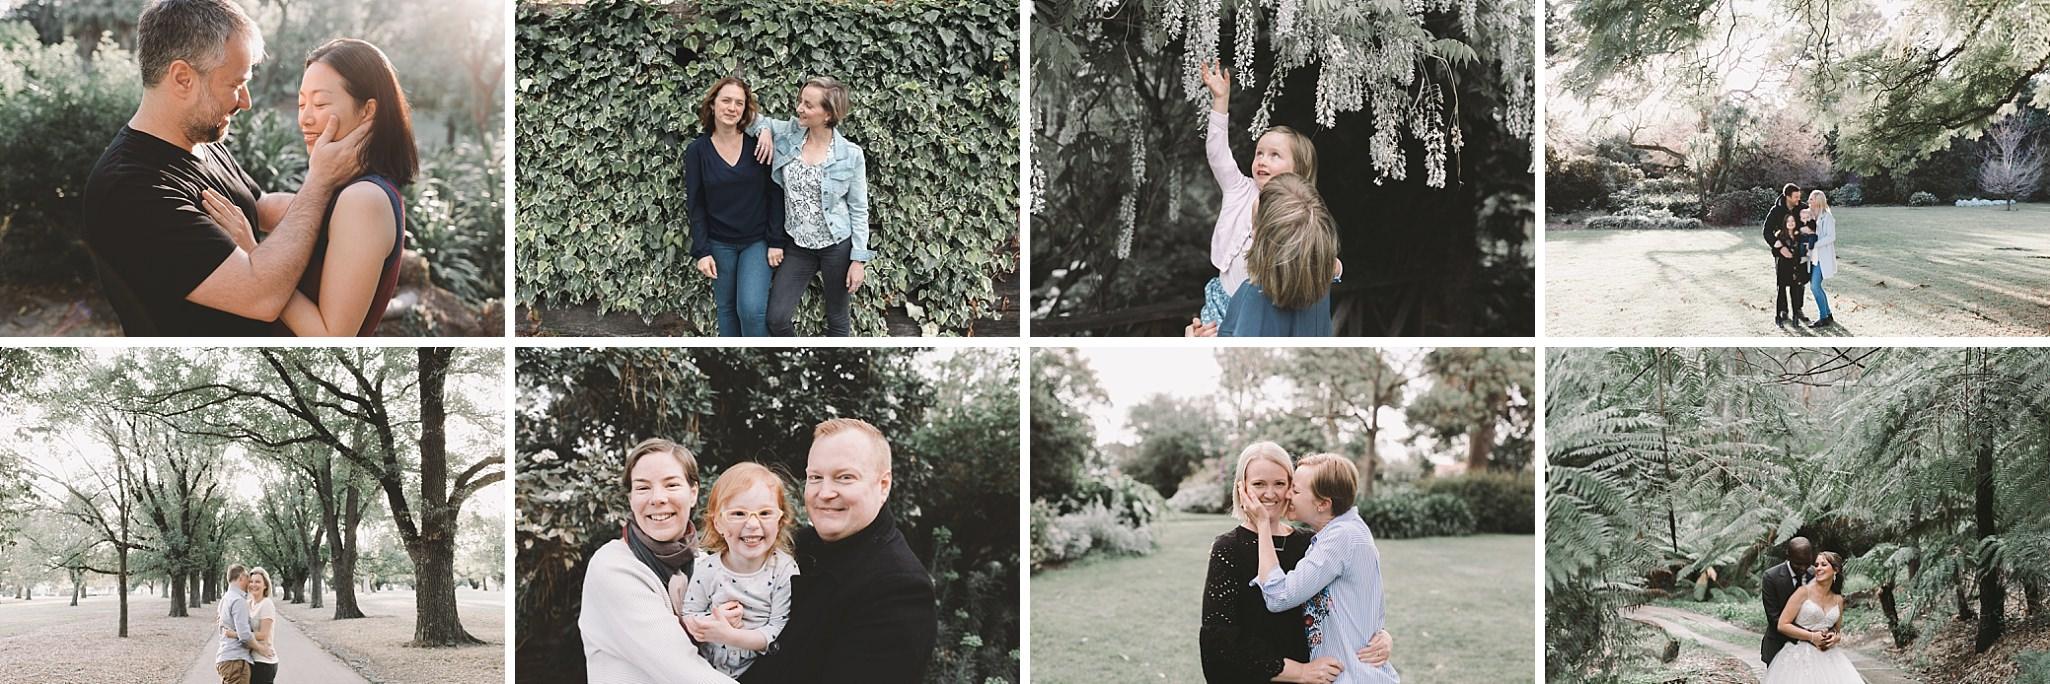 Lecinda Ward, Melbourne Family Newborn and Wedding Photographer_0083.jpg